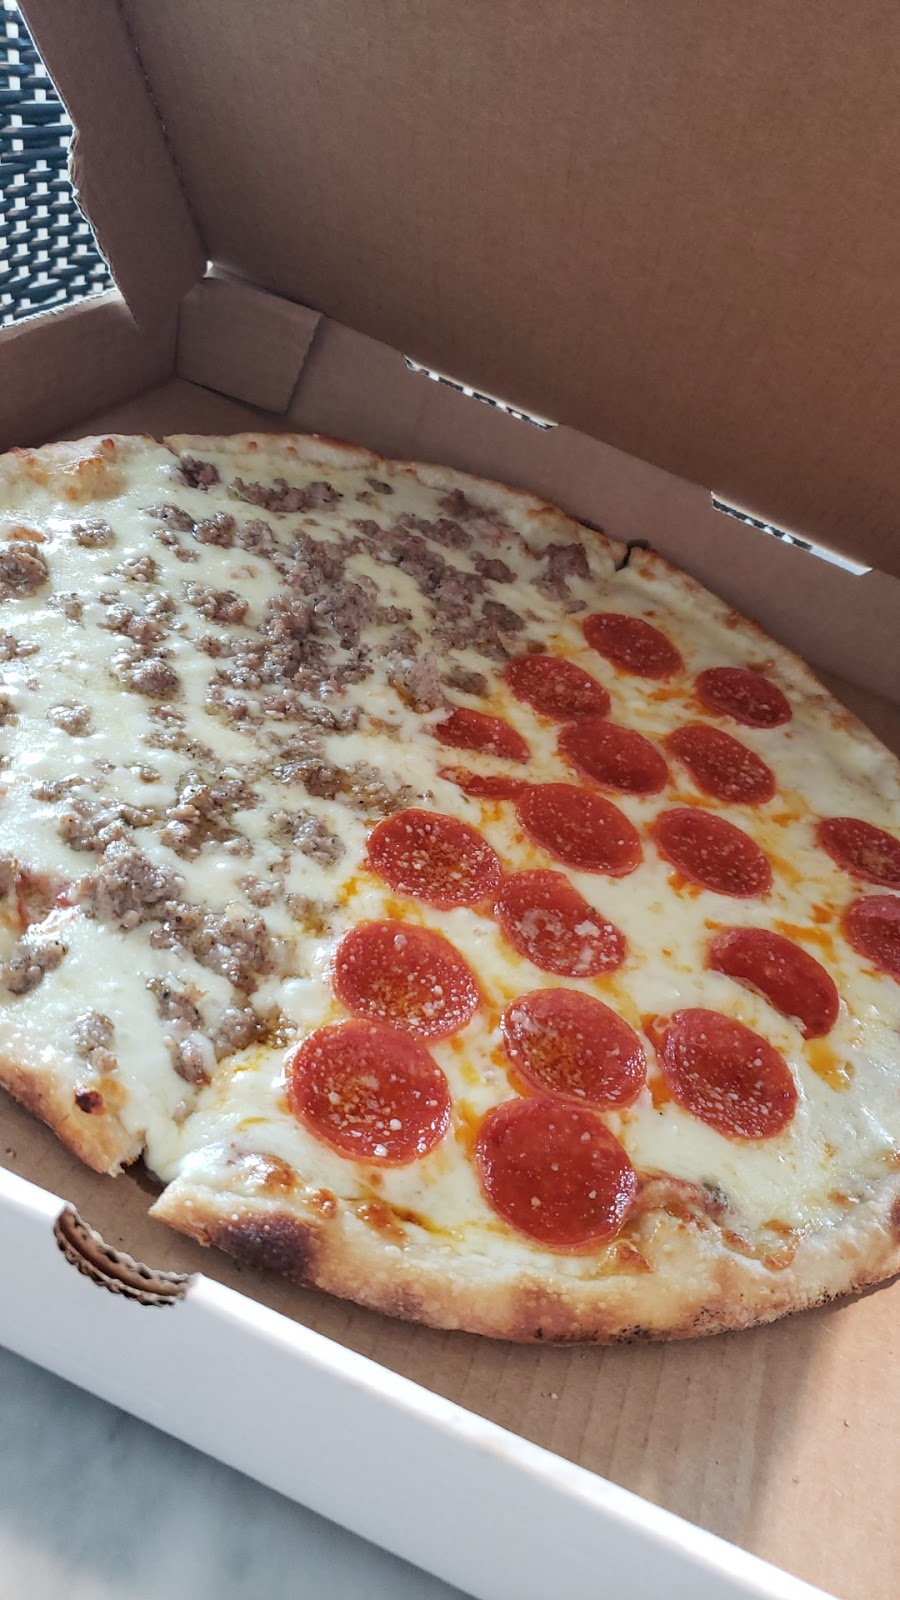 Viola & Dots Italian Kitchen & Pizzeria | restaurant | 1390 NW 80th Ave, Ocala, FL 34482, USA | 3524147877 OR +1 352-414-7877